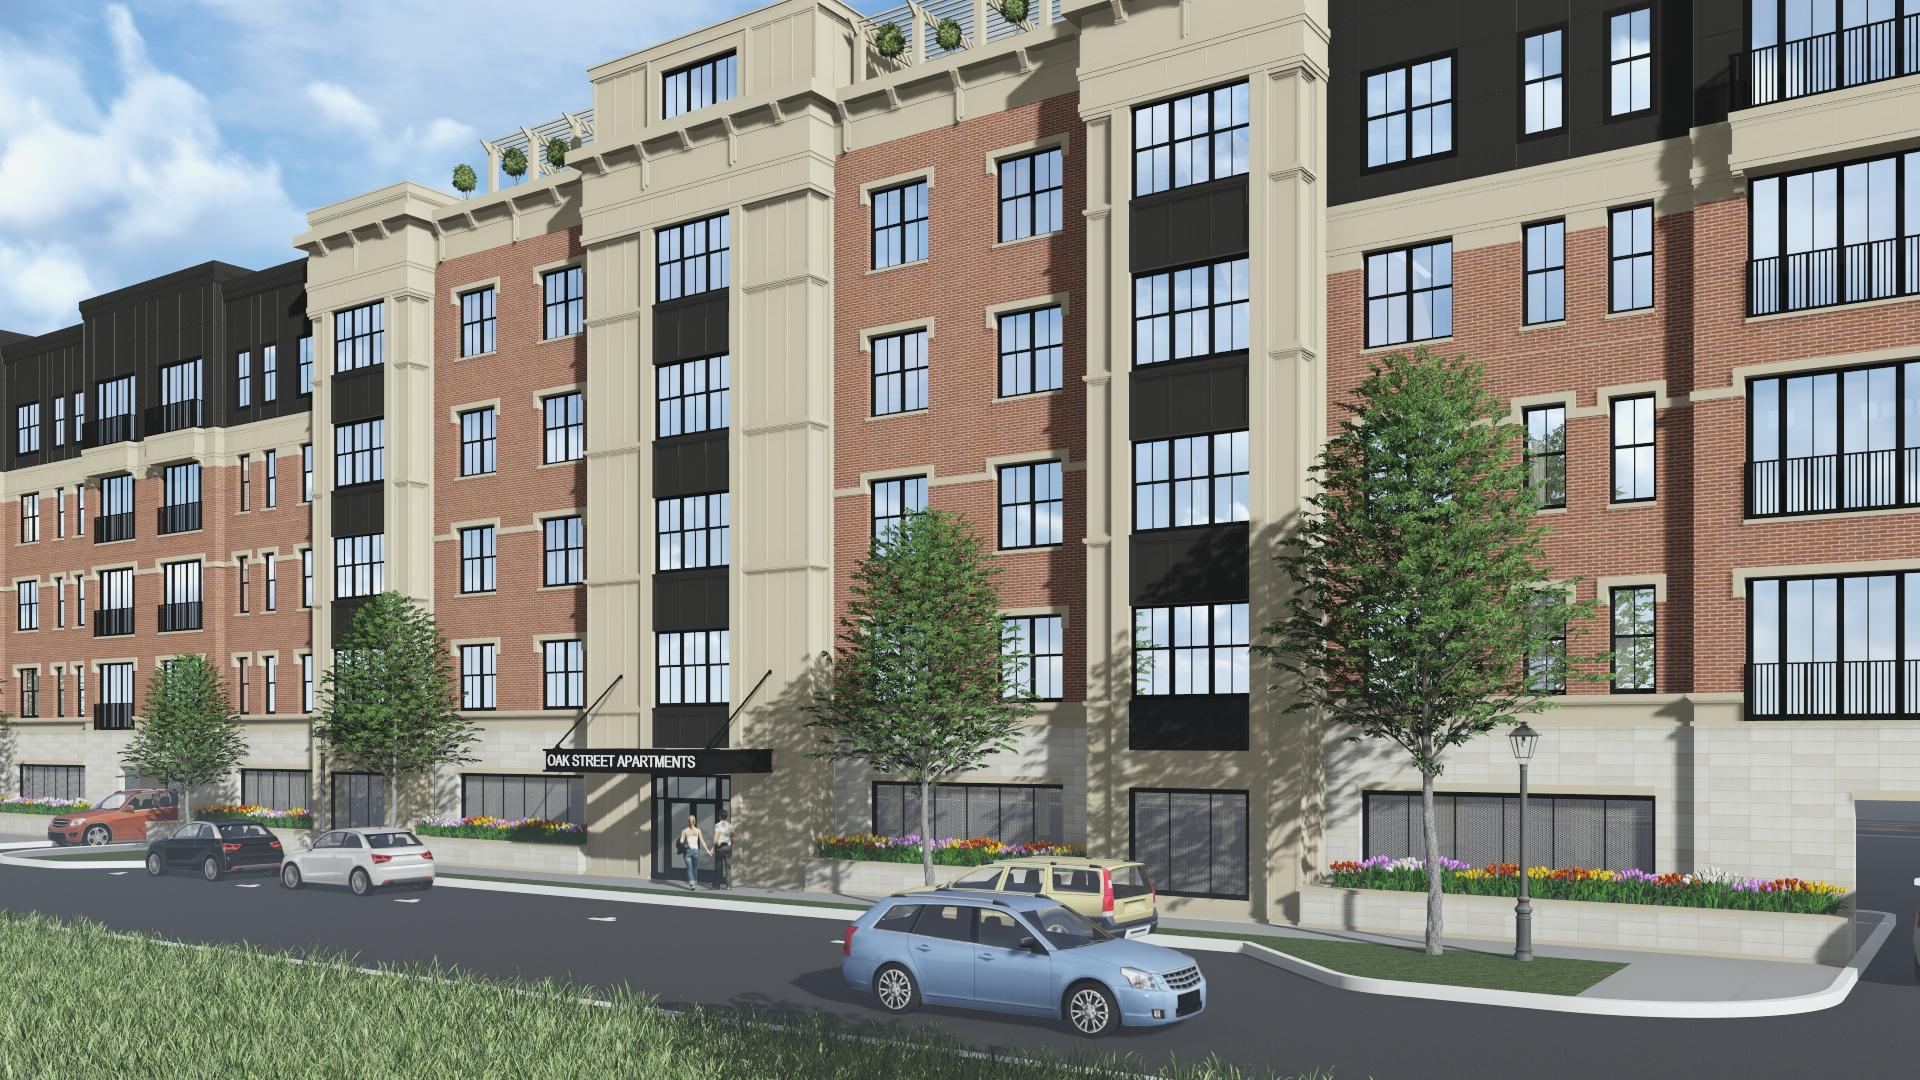 2015.12.01_Oak Street Apartments_V02.jpg